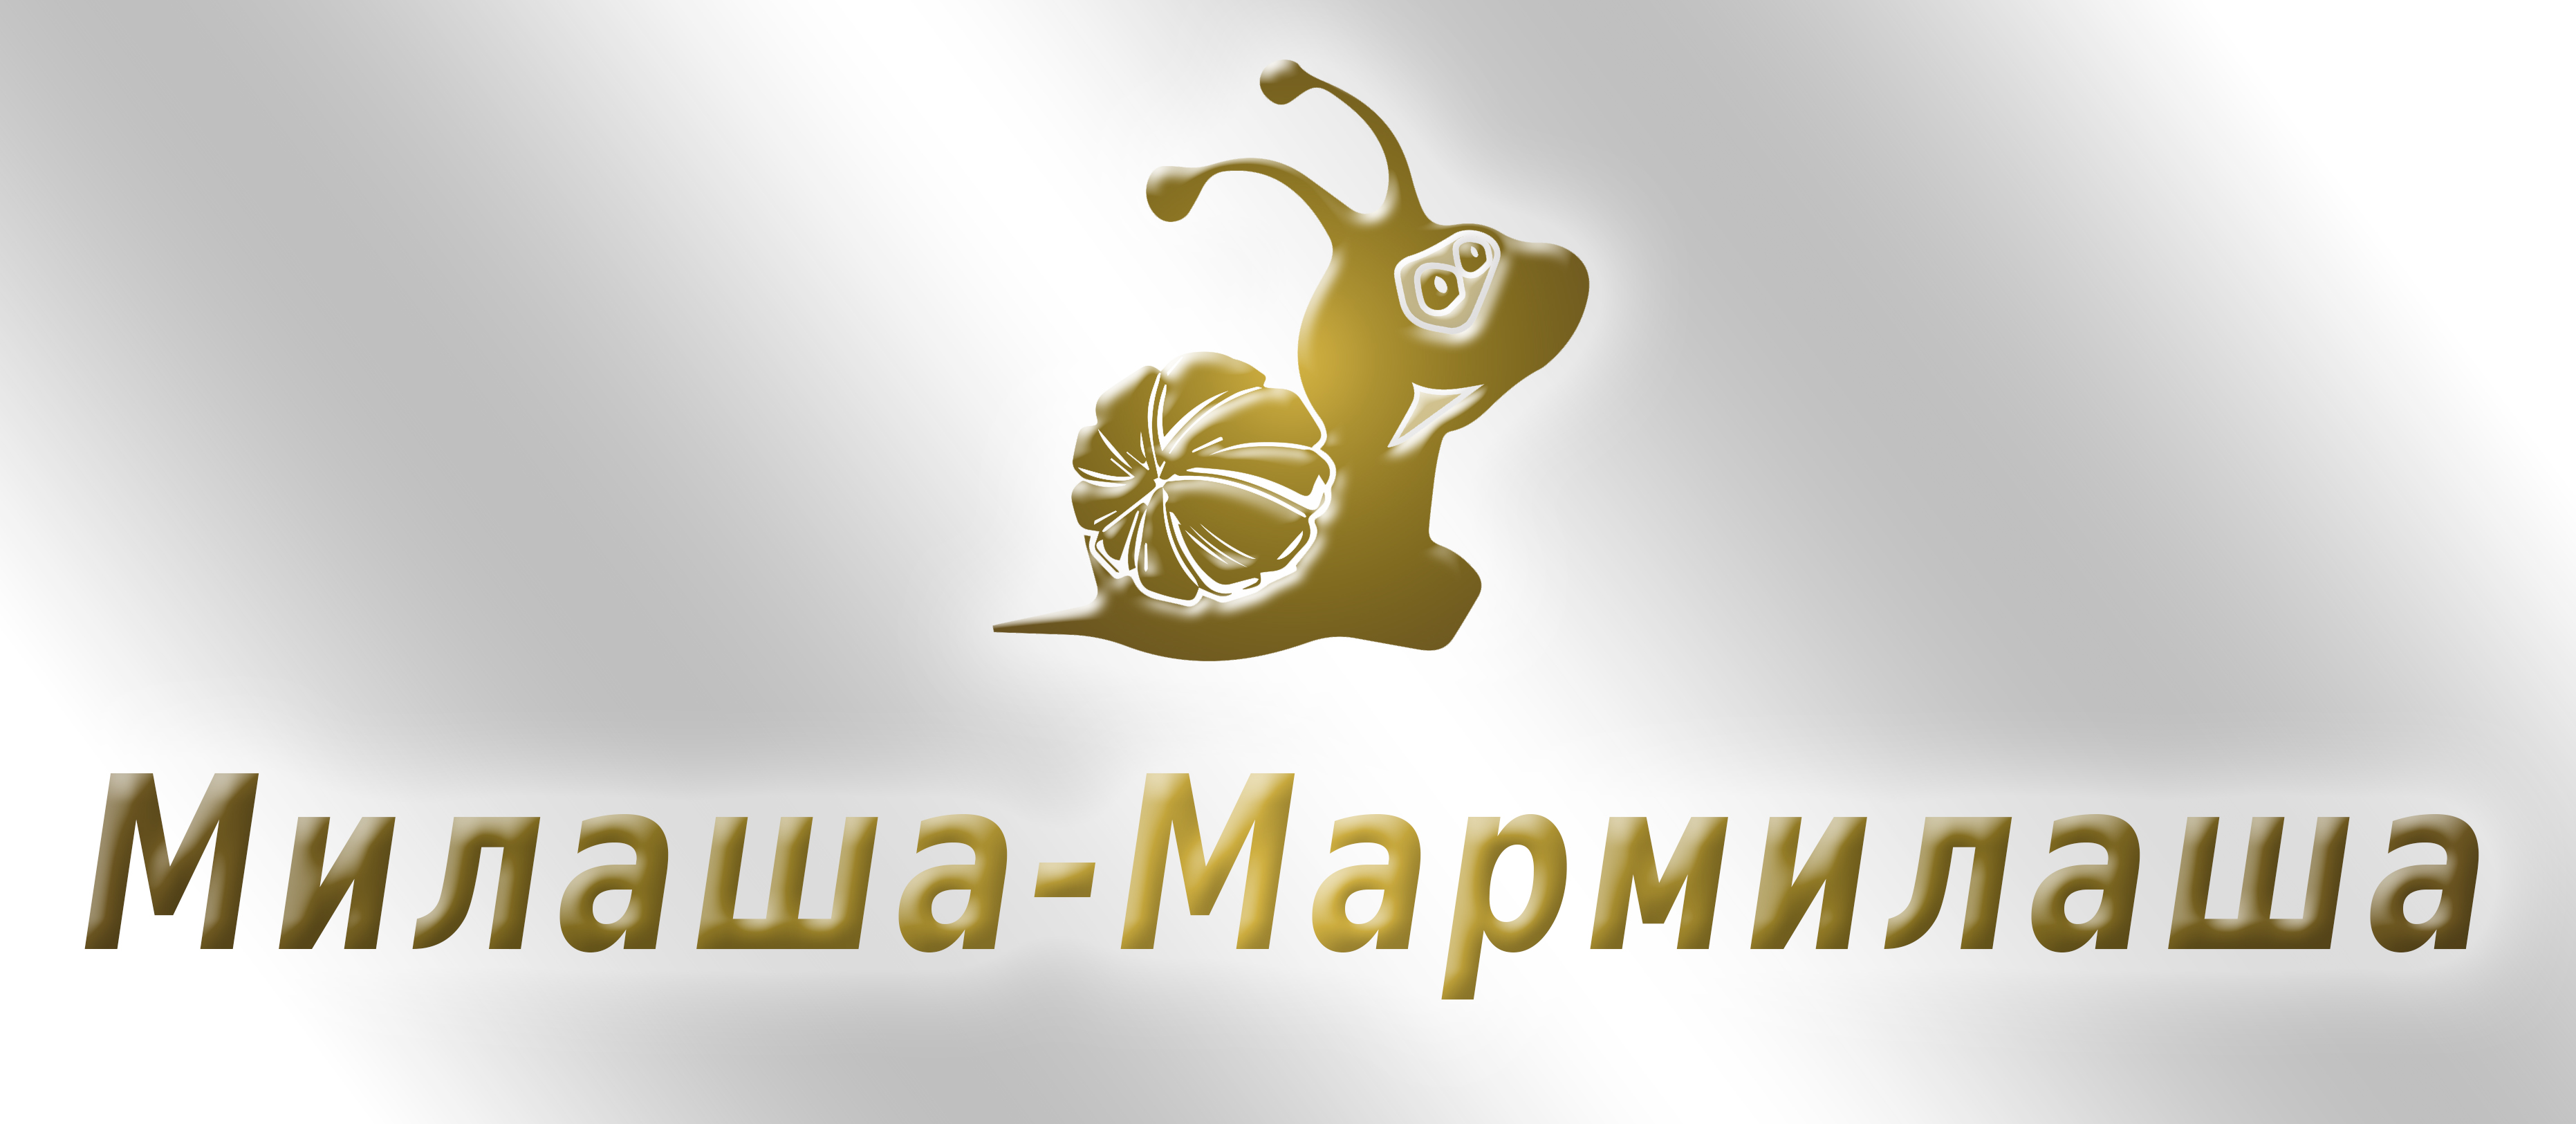 "Логотип для товарного знака ""Милаша-Мармилаша"" фото f_482587654a35ef1f.jpg"